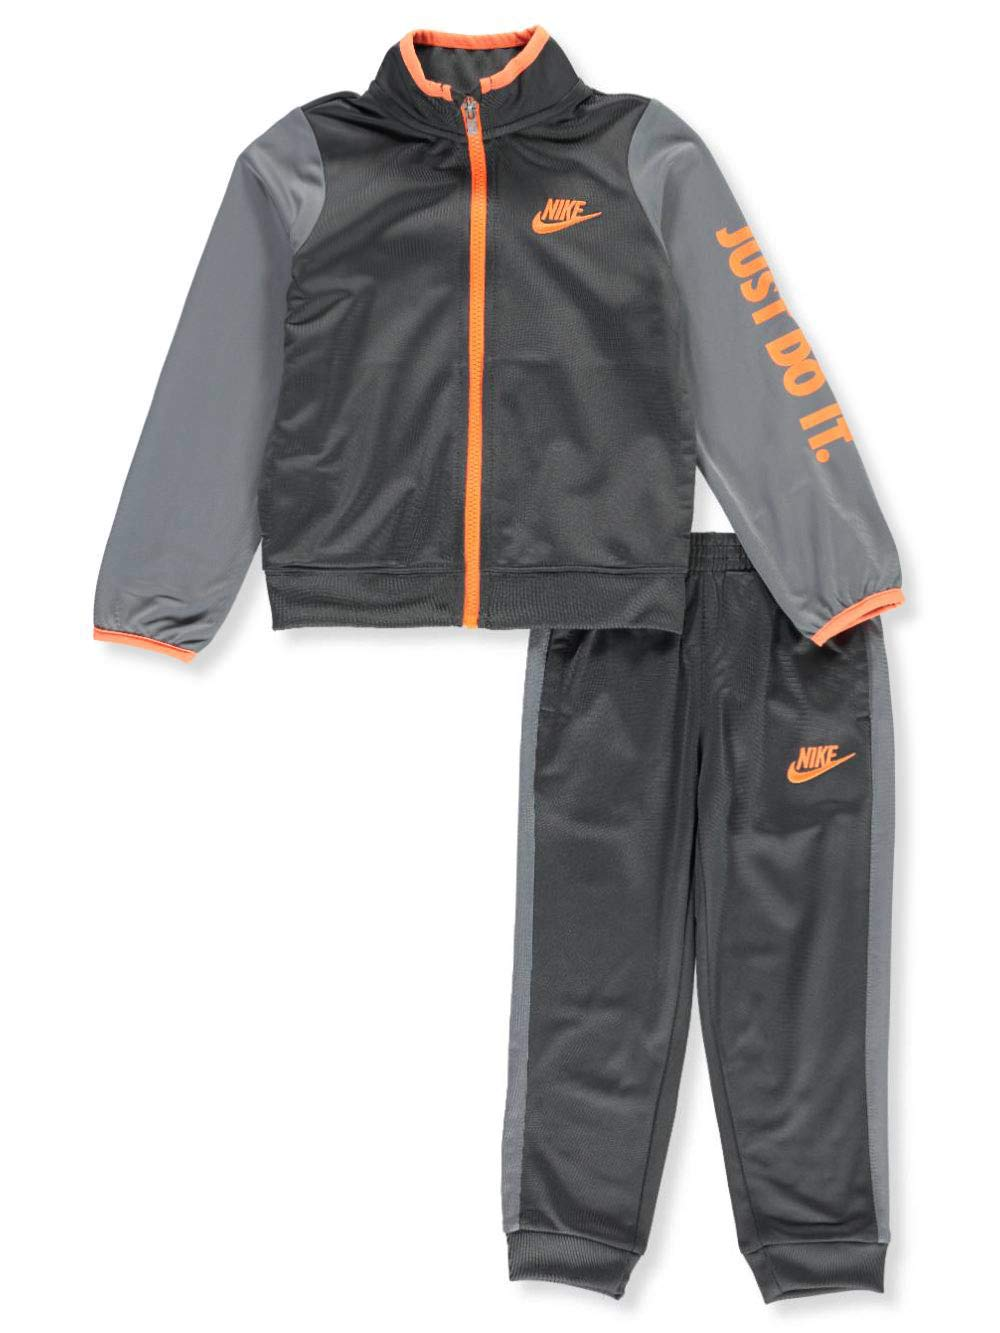 NIKE Boy's Futura Tricot Jacket and Pants Set (Anthracite (86C626-693) /Max Orange/Anthracite, 7)